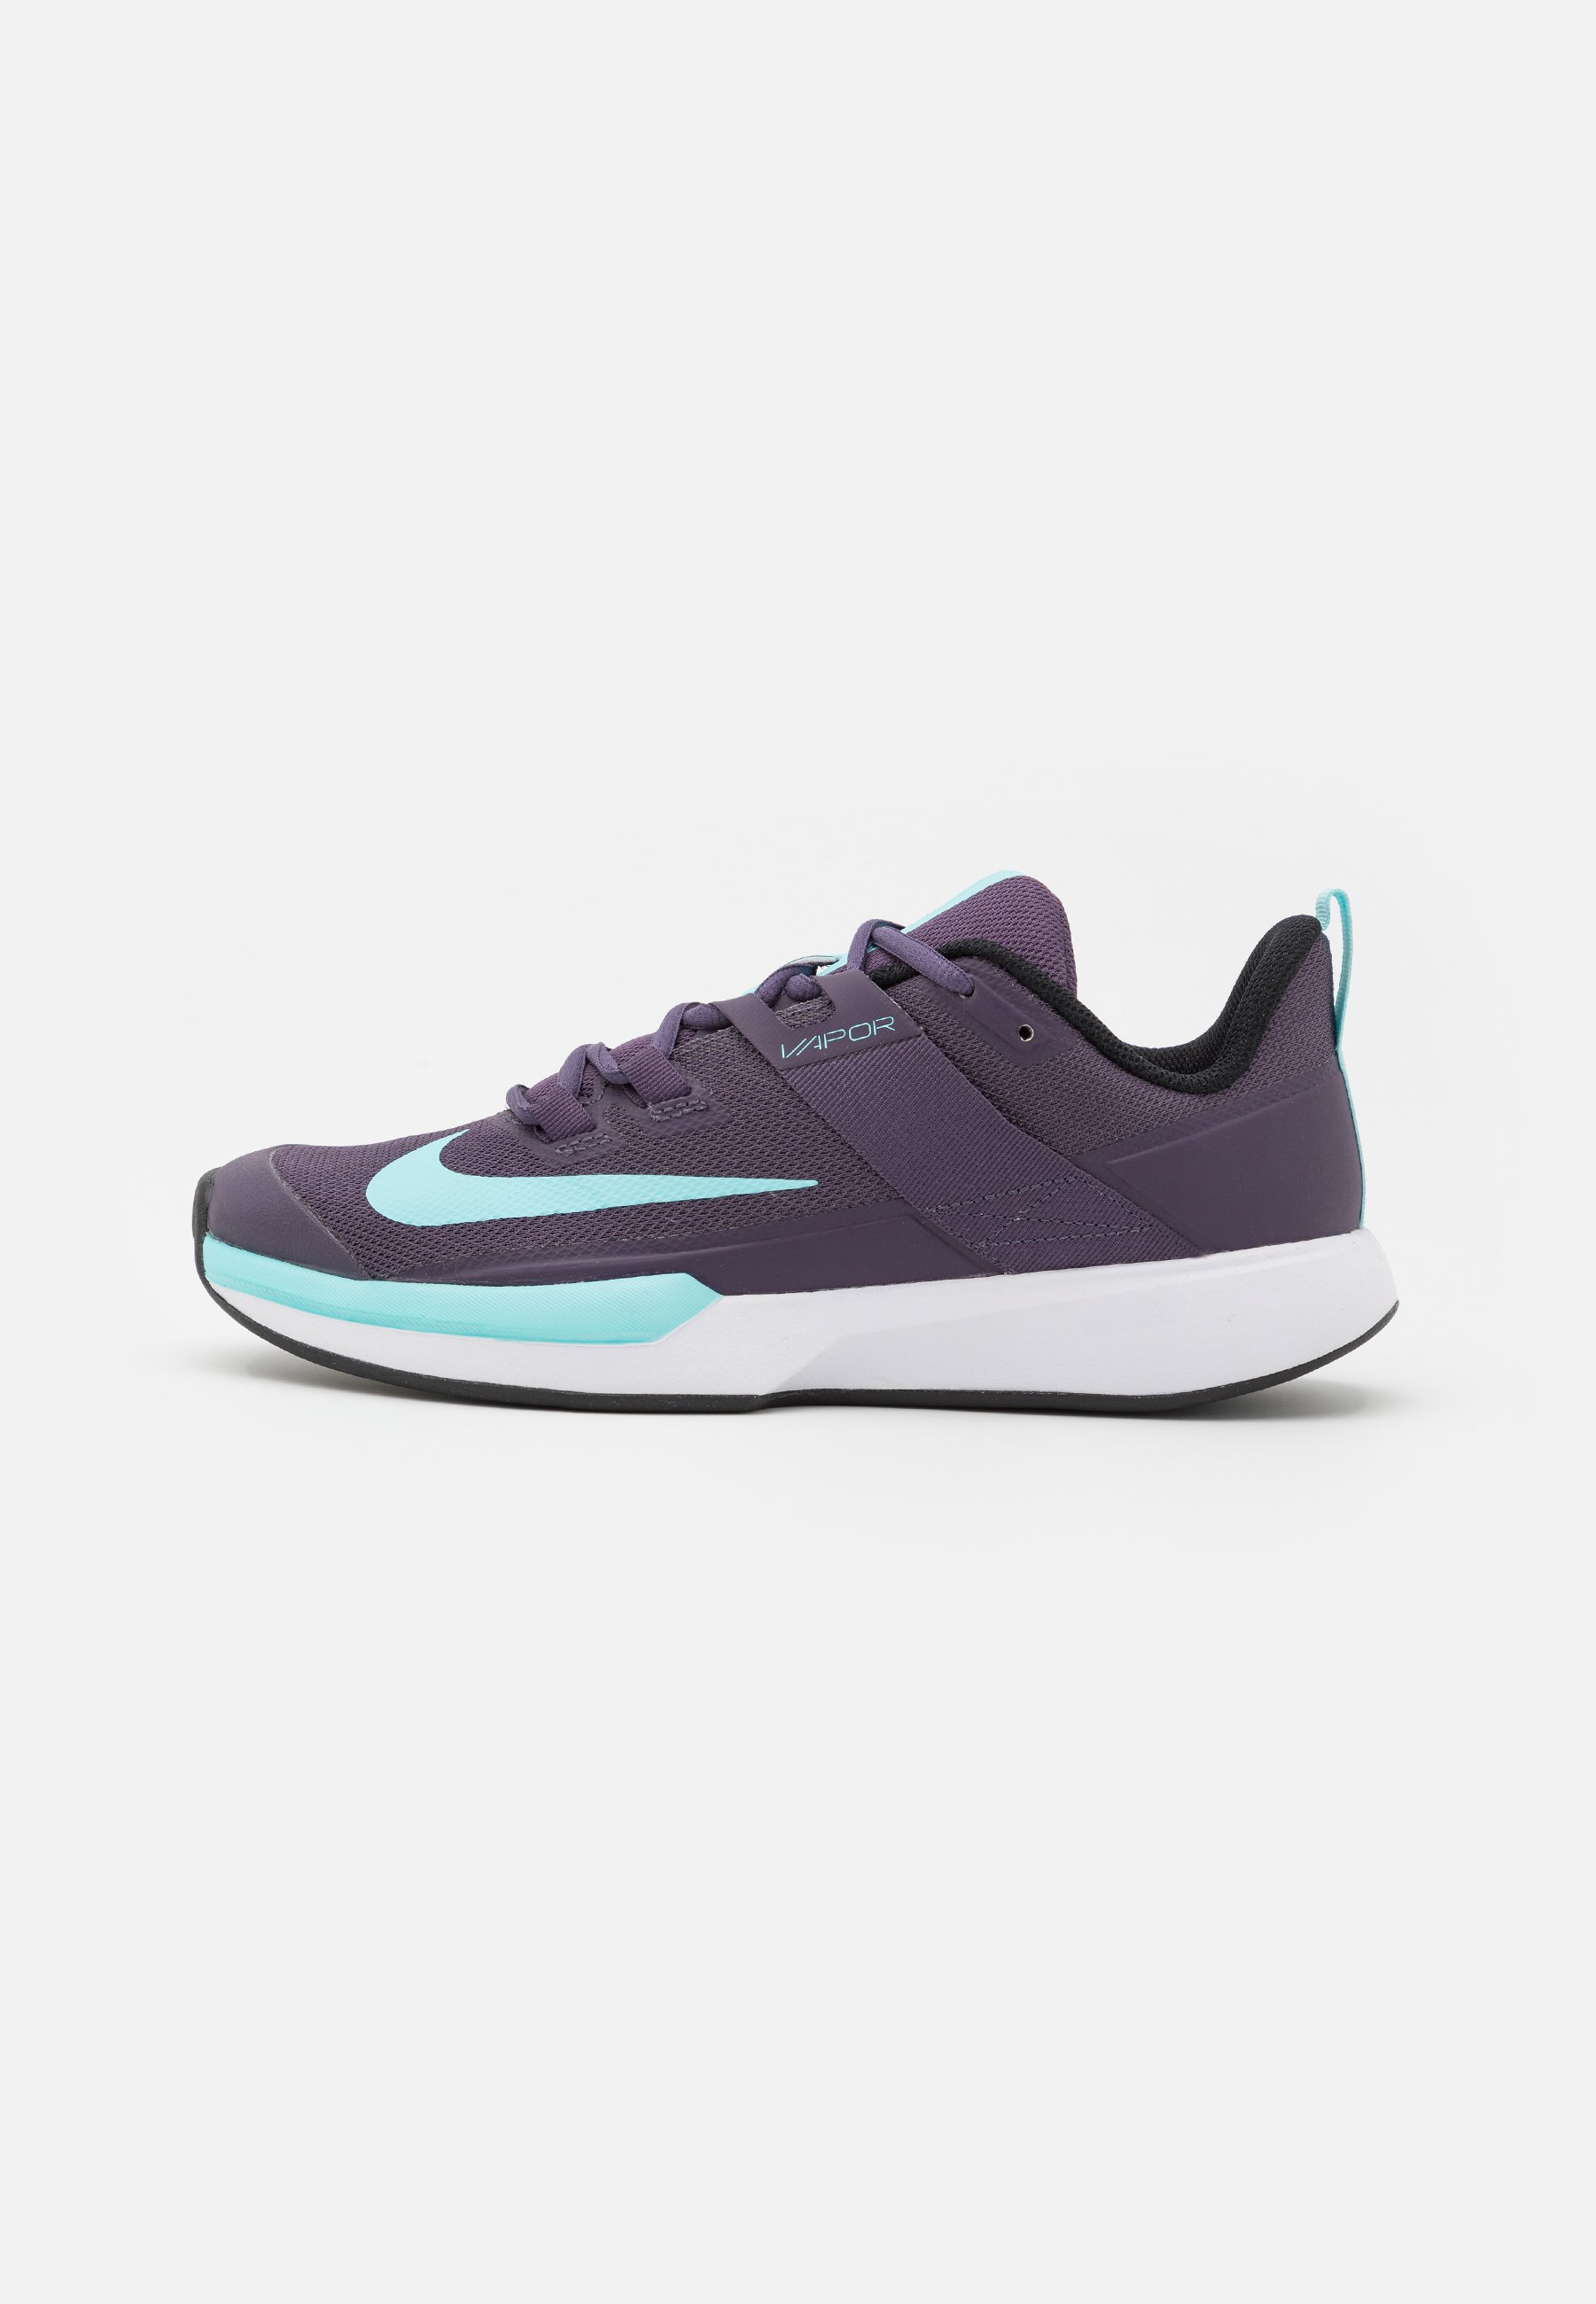 Femme COURT VAPOR LITE CLAY - Chaussures de tennis pour terre-battueerre battue